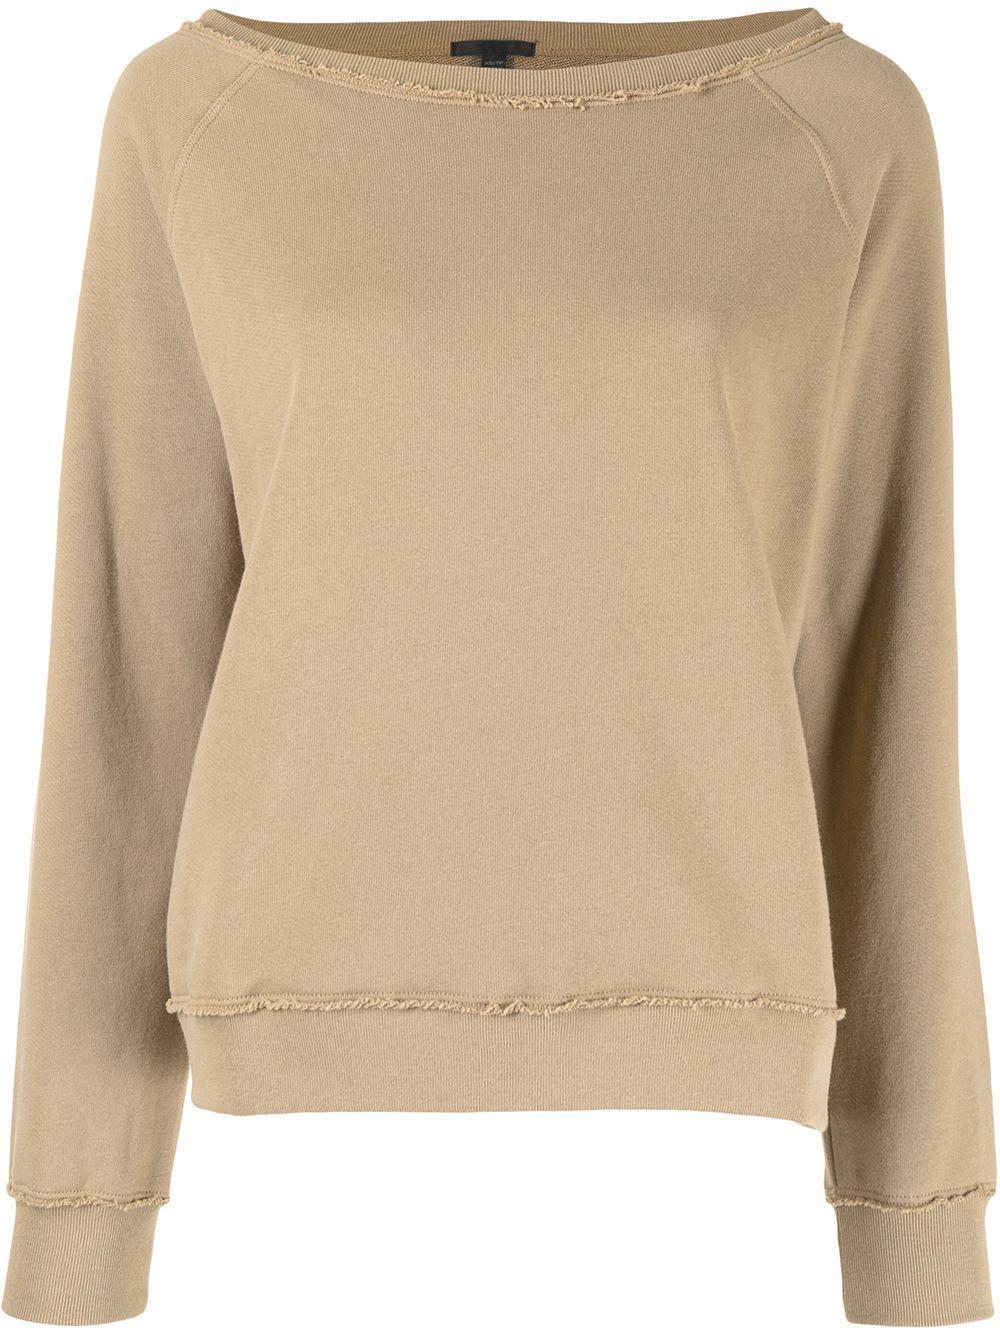 French Terry Sweatshirt